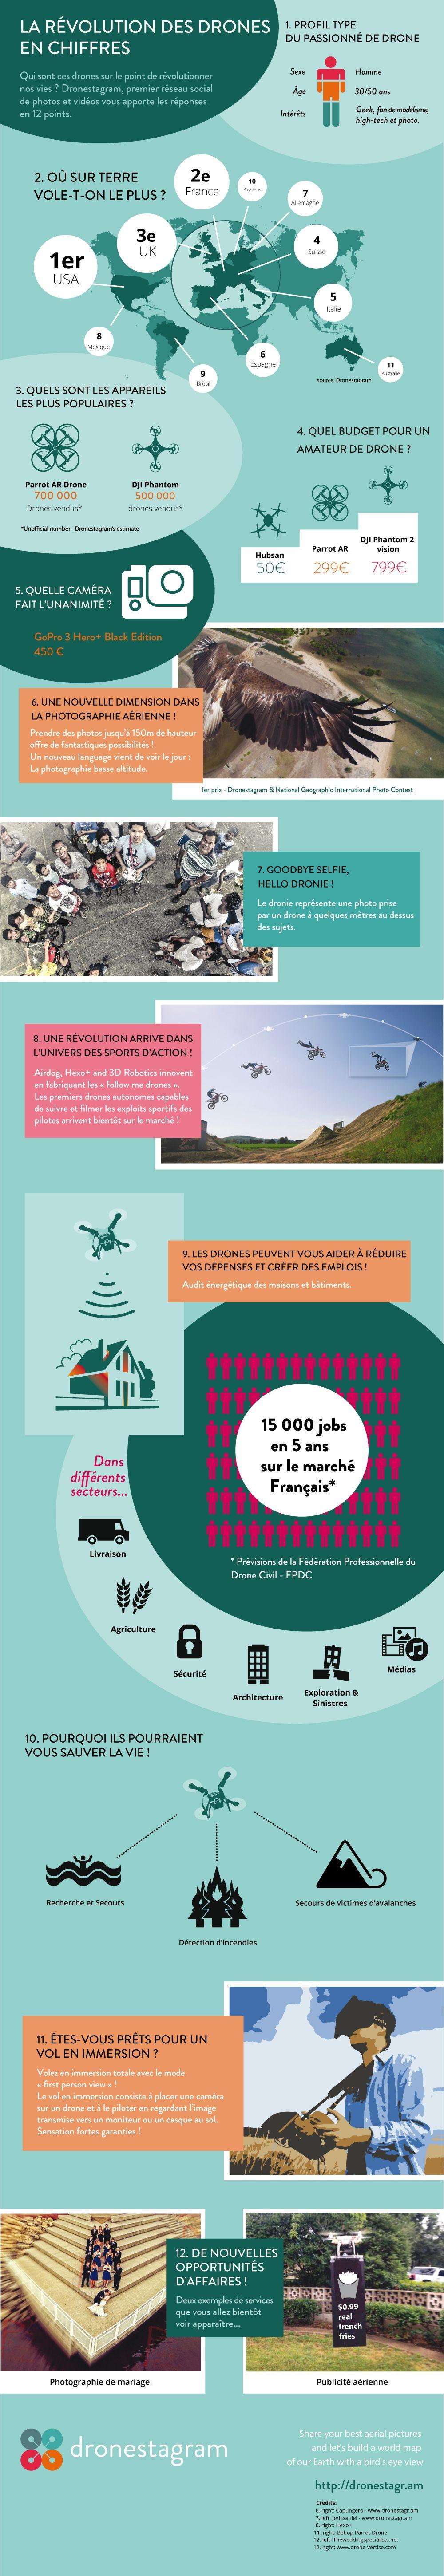 Dronestagram-drones-loisirs-infographie